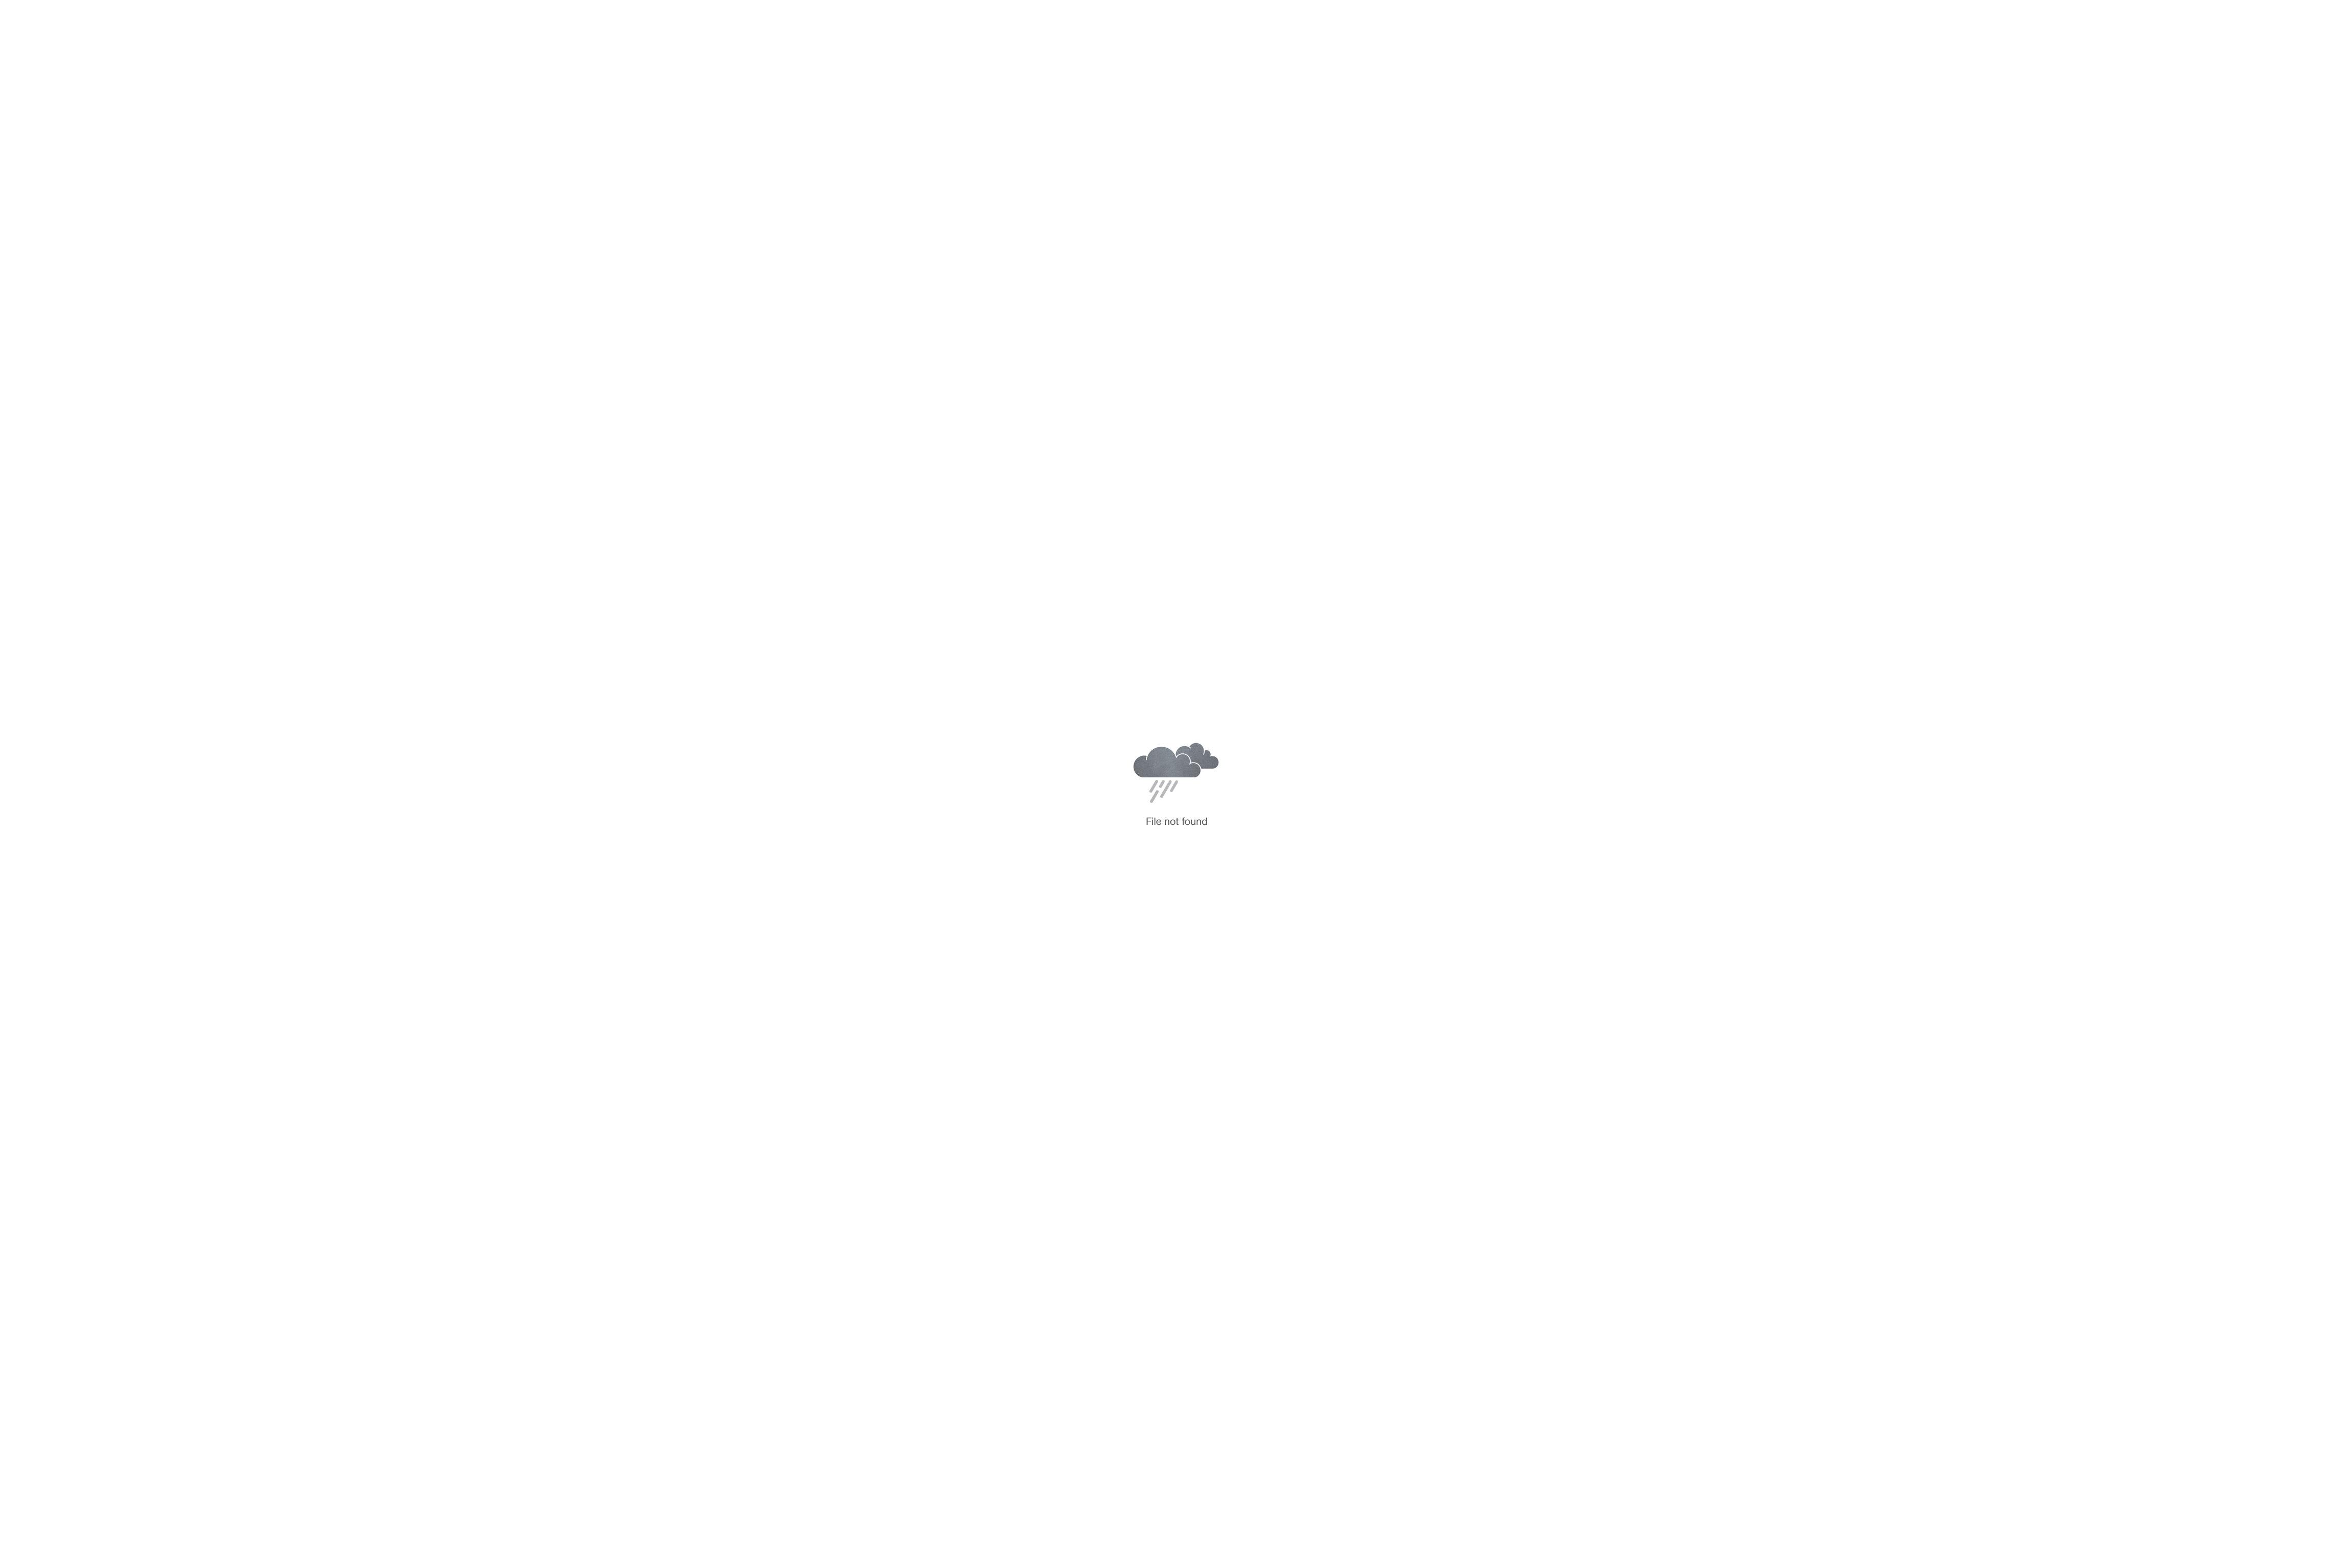 Association sportive-Lycée Romain Rolland Goussainville-Rugby-Sponsorise-me-image-3